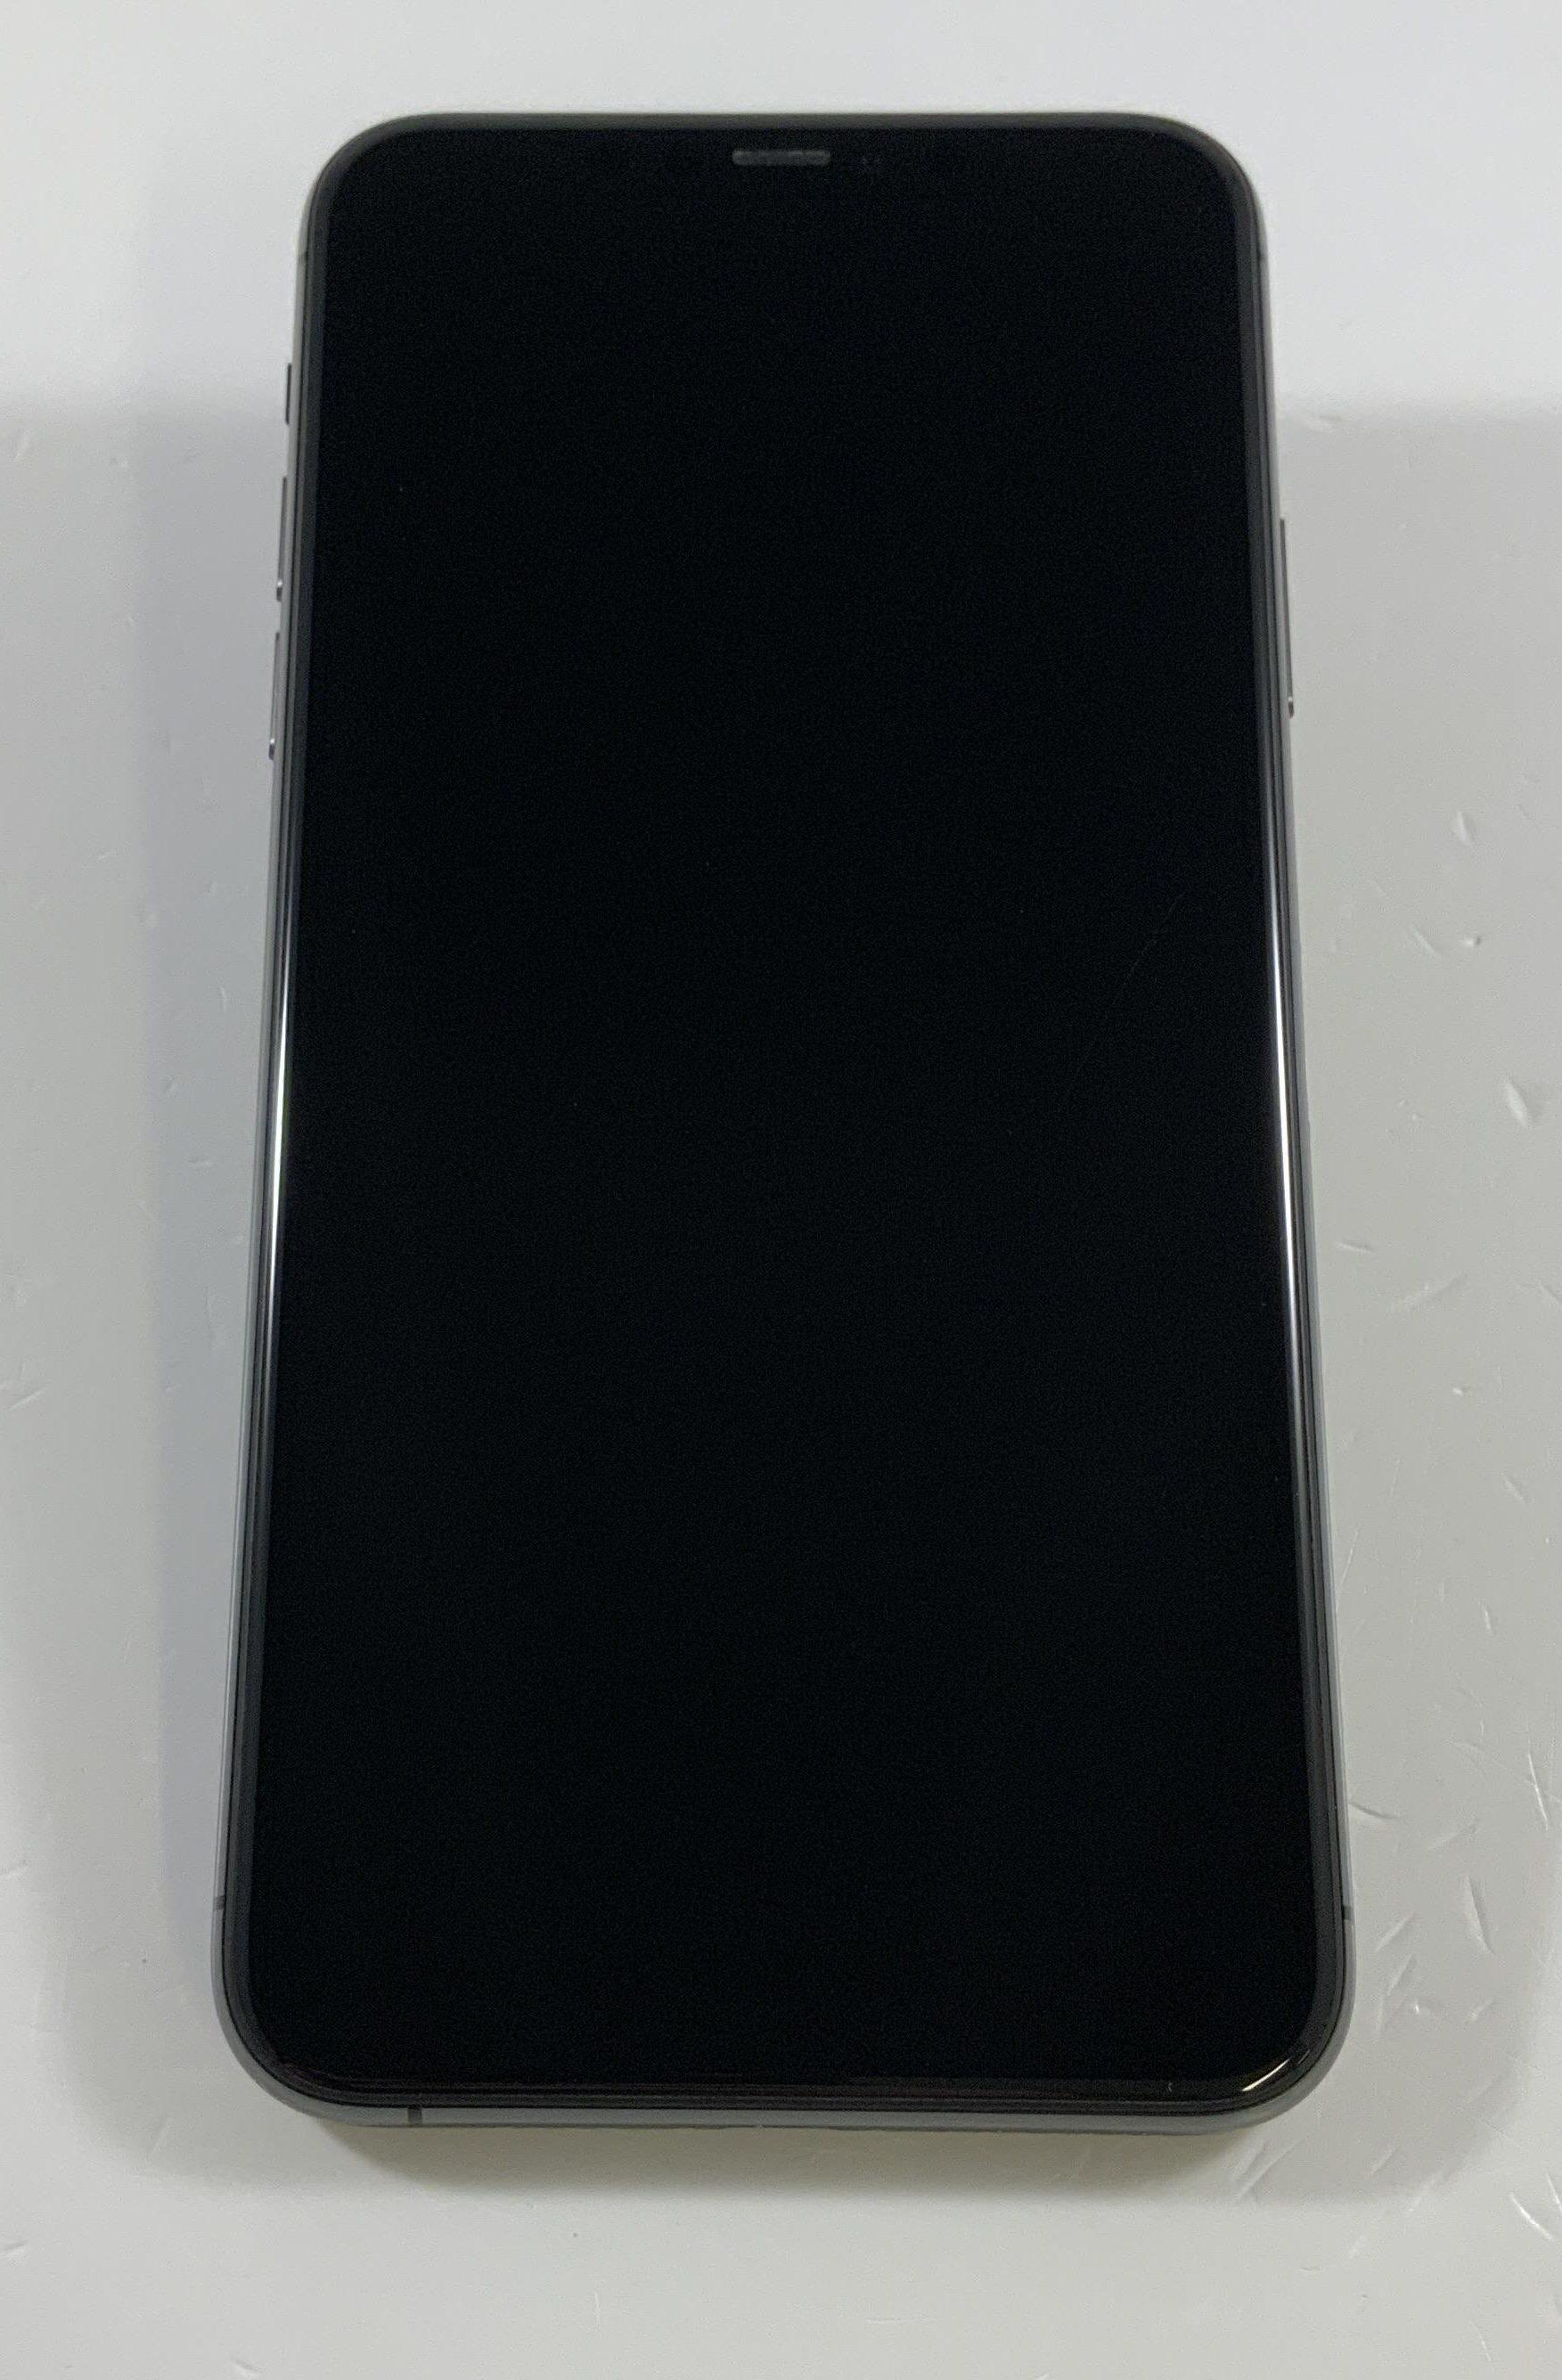 iPhone 11 Pro Max 256GB, 256GB, Space Gray, Bild 1